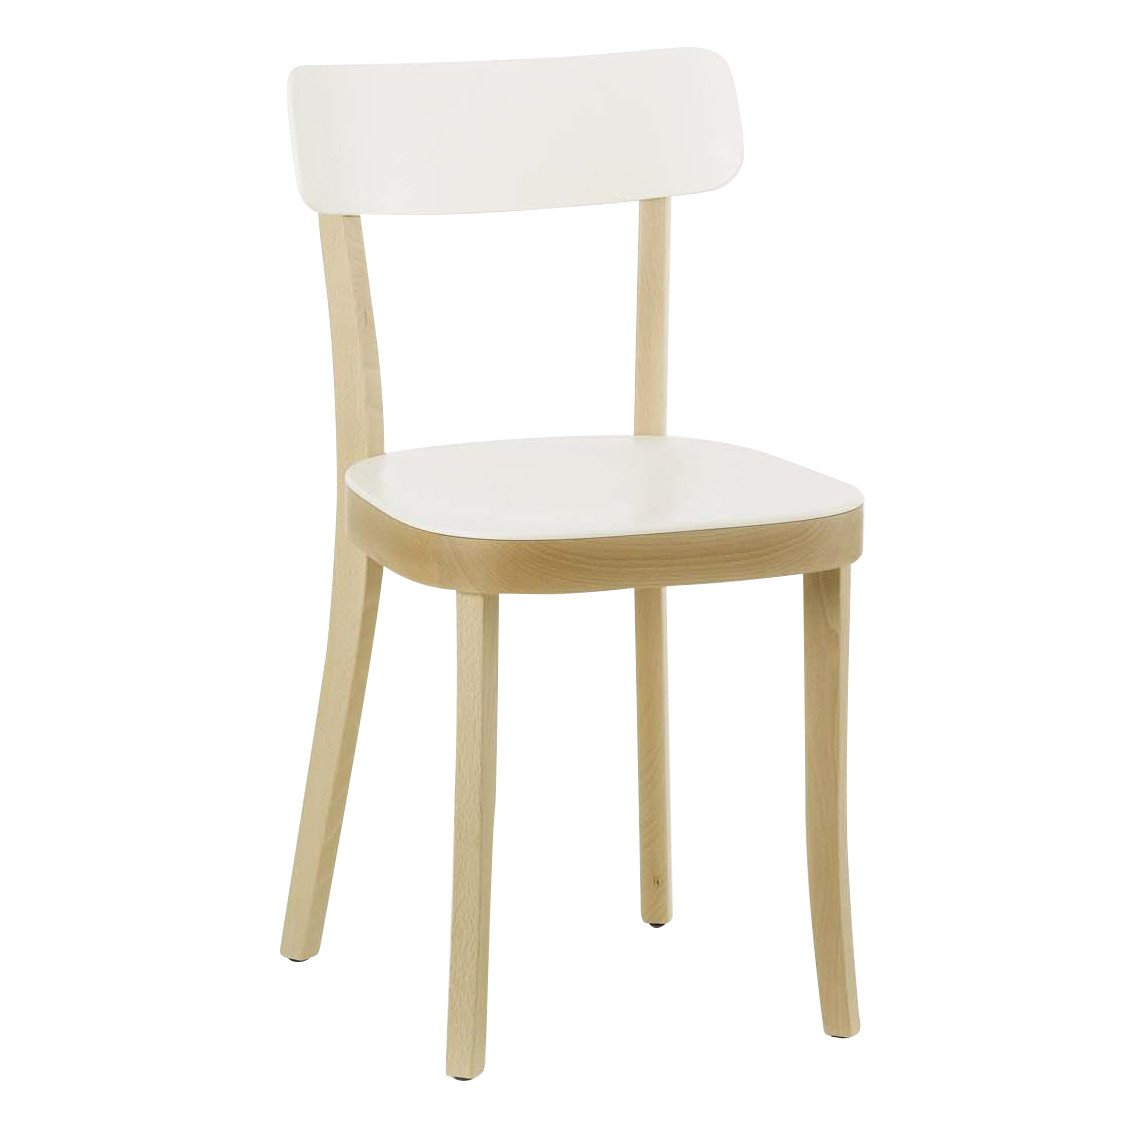 basel chair vitra. Black Bedroom Furniture Sets. Home Design Ideas